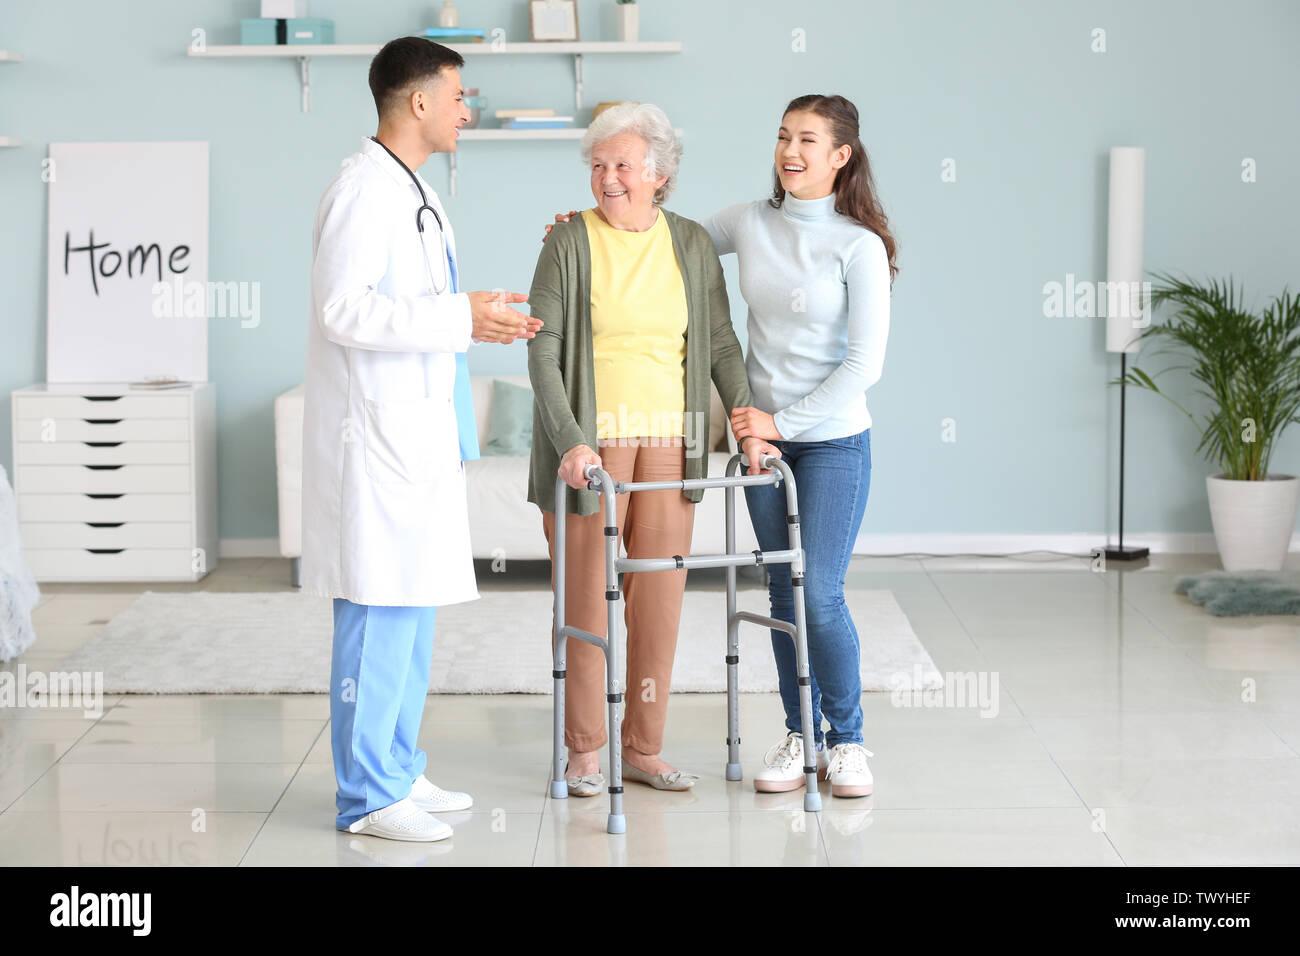 Doctor visiting senior woman at home - Stock Image